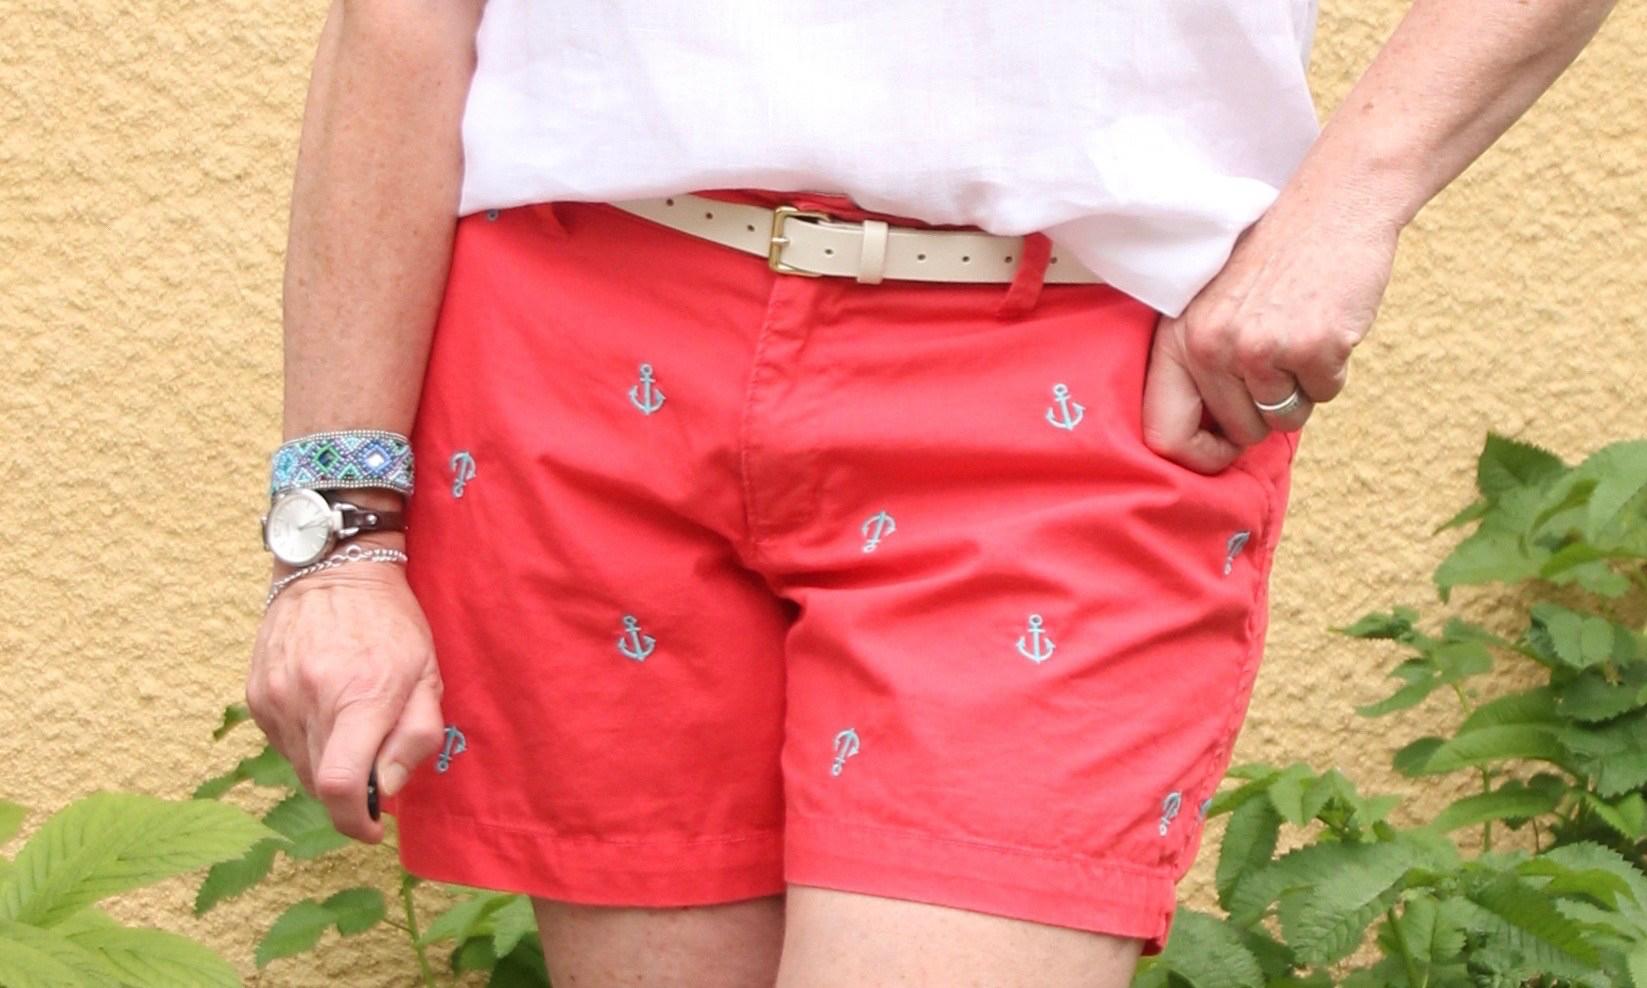 ndwc_linen-top_shorts_closeup.jpg